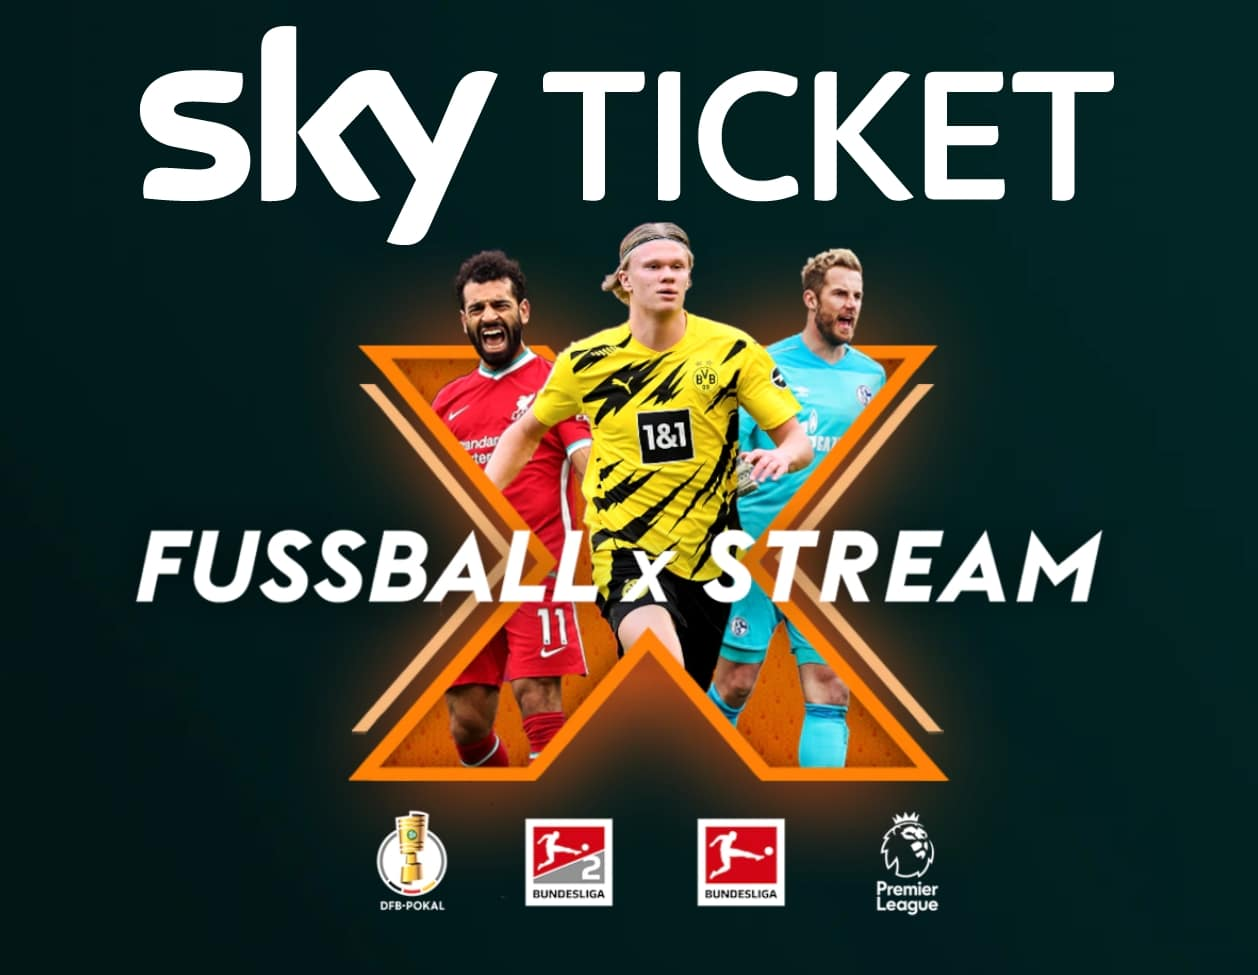 sky-angebote-sky-ticket-supersport-angebot